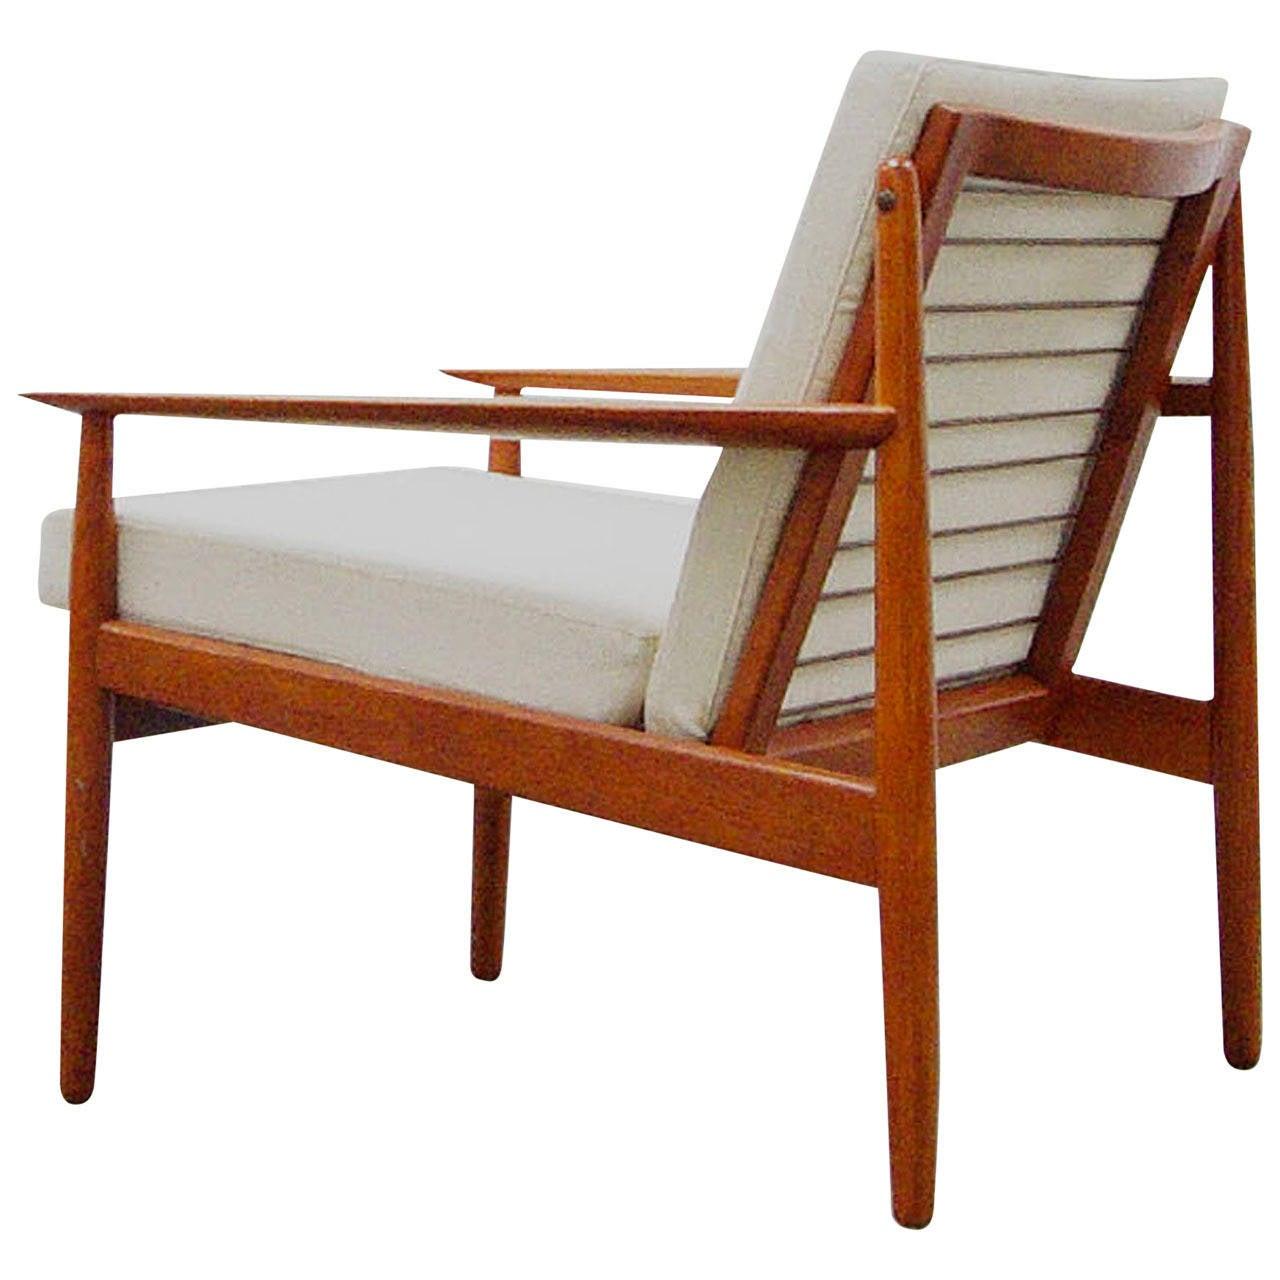 Easy chair by arne vodder for glostrup teak mid century for Danish furniture